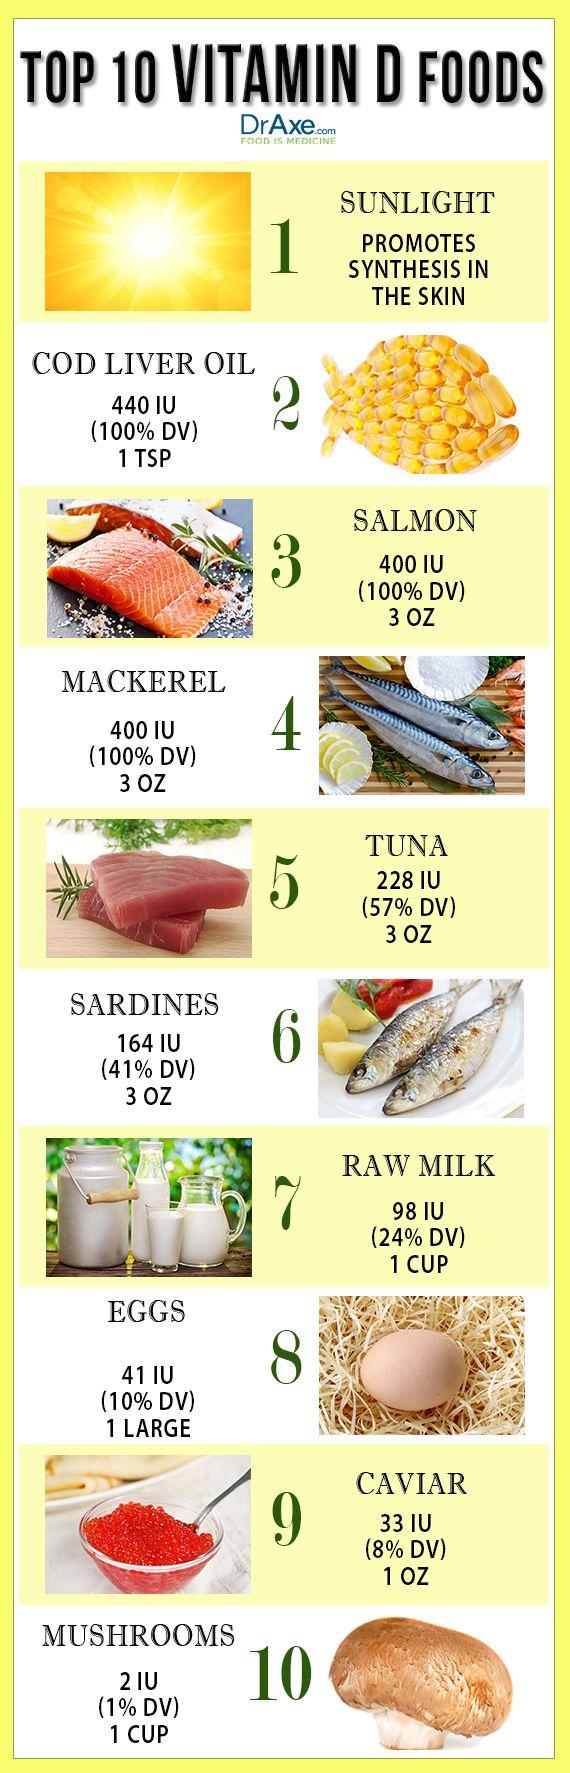 Top Vitamin D Foods Their 5 Major Benefits Dr Axe Vitamin D Rich Food Vitamin D Foods Vitamins